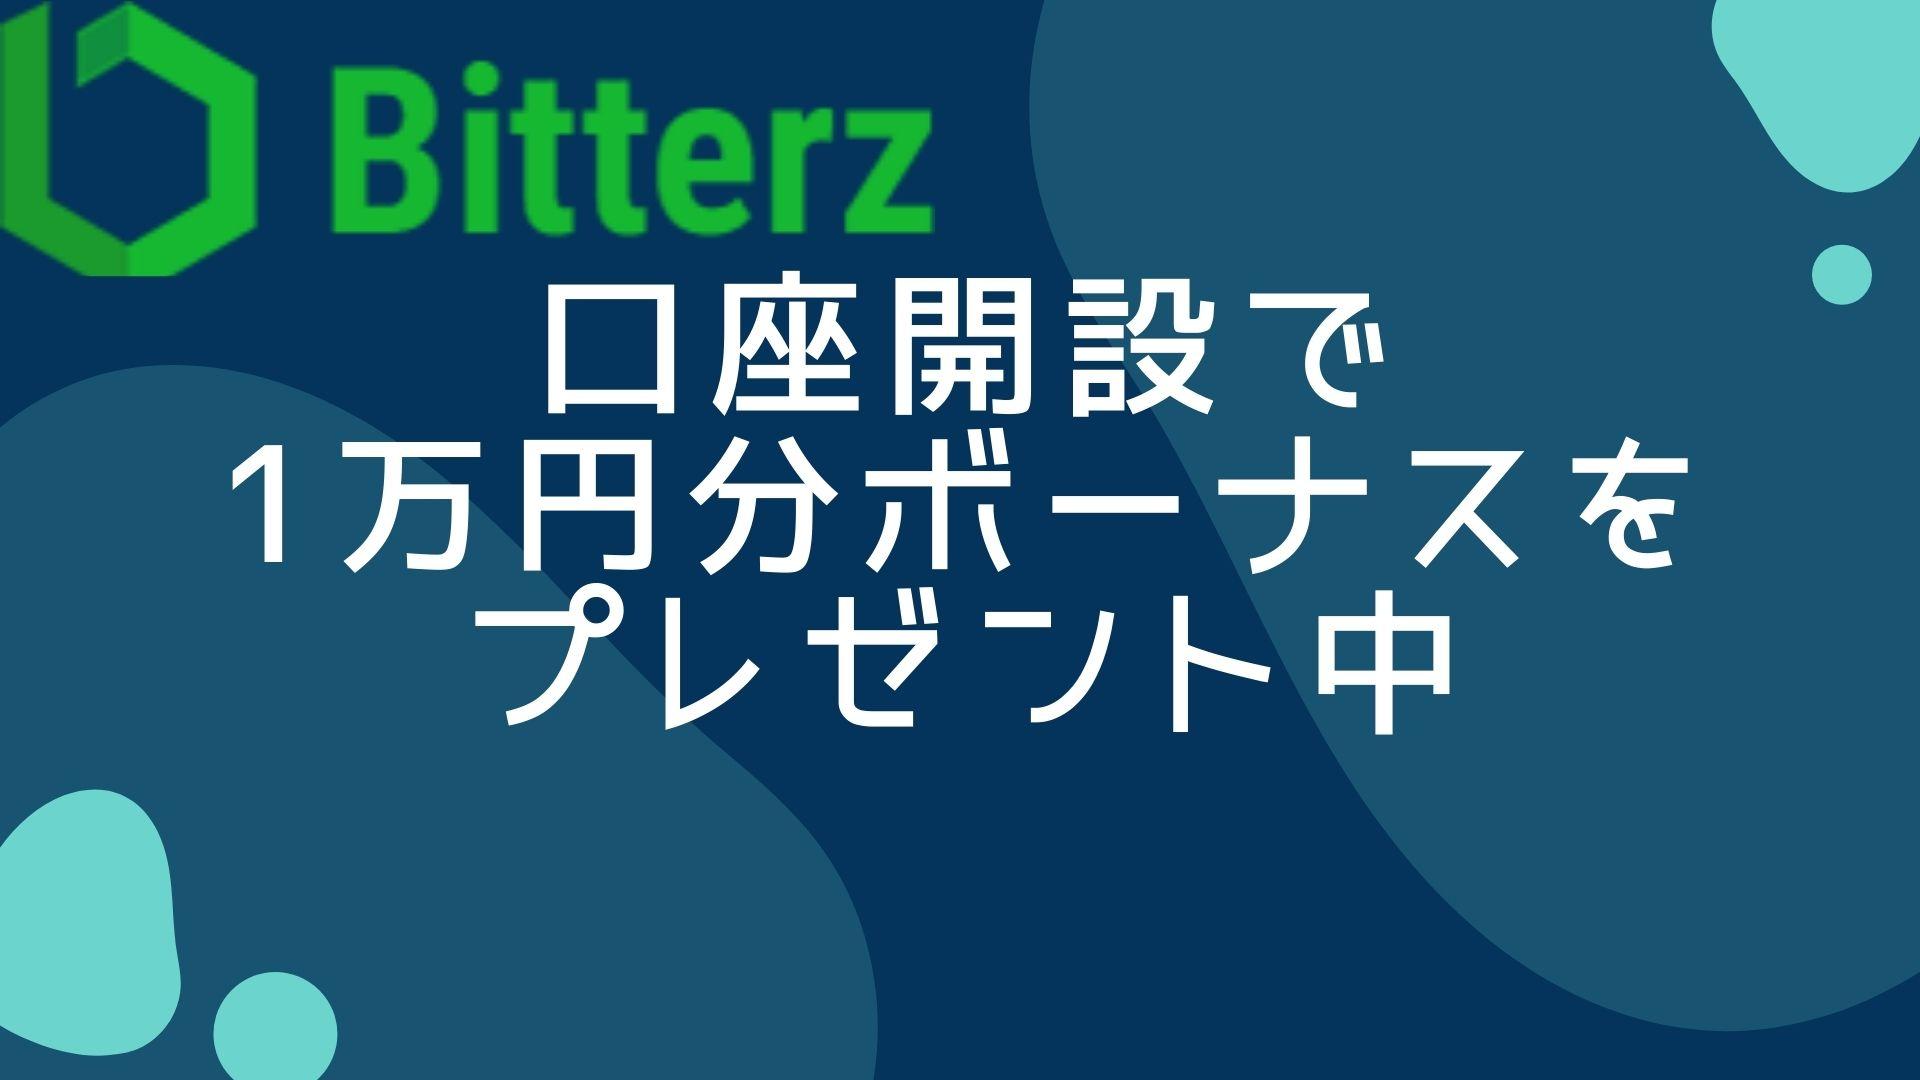 bitterz-account-opening-bonus-title